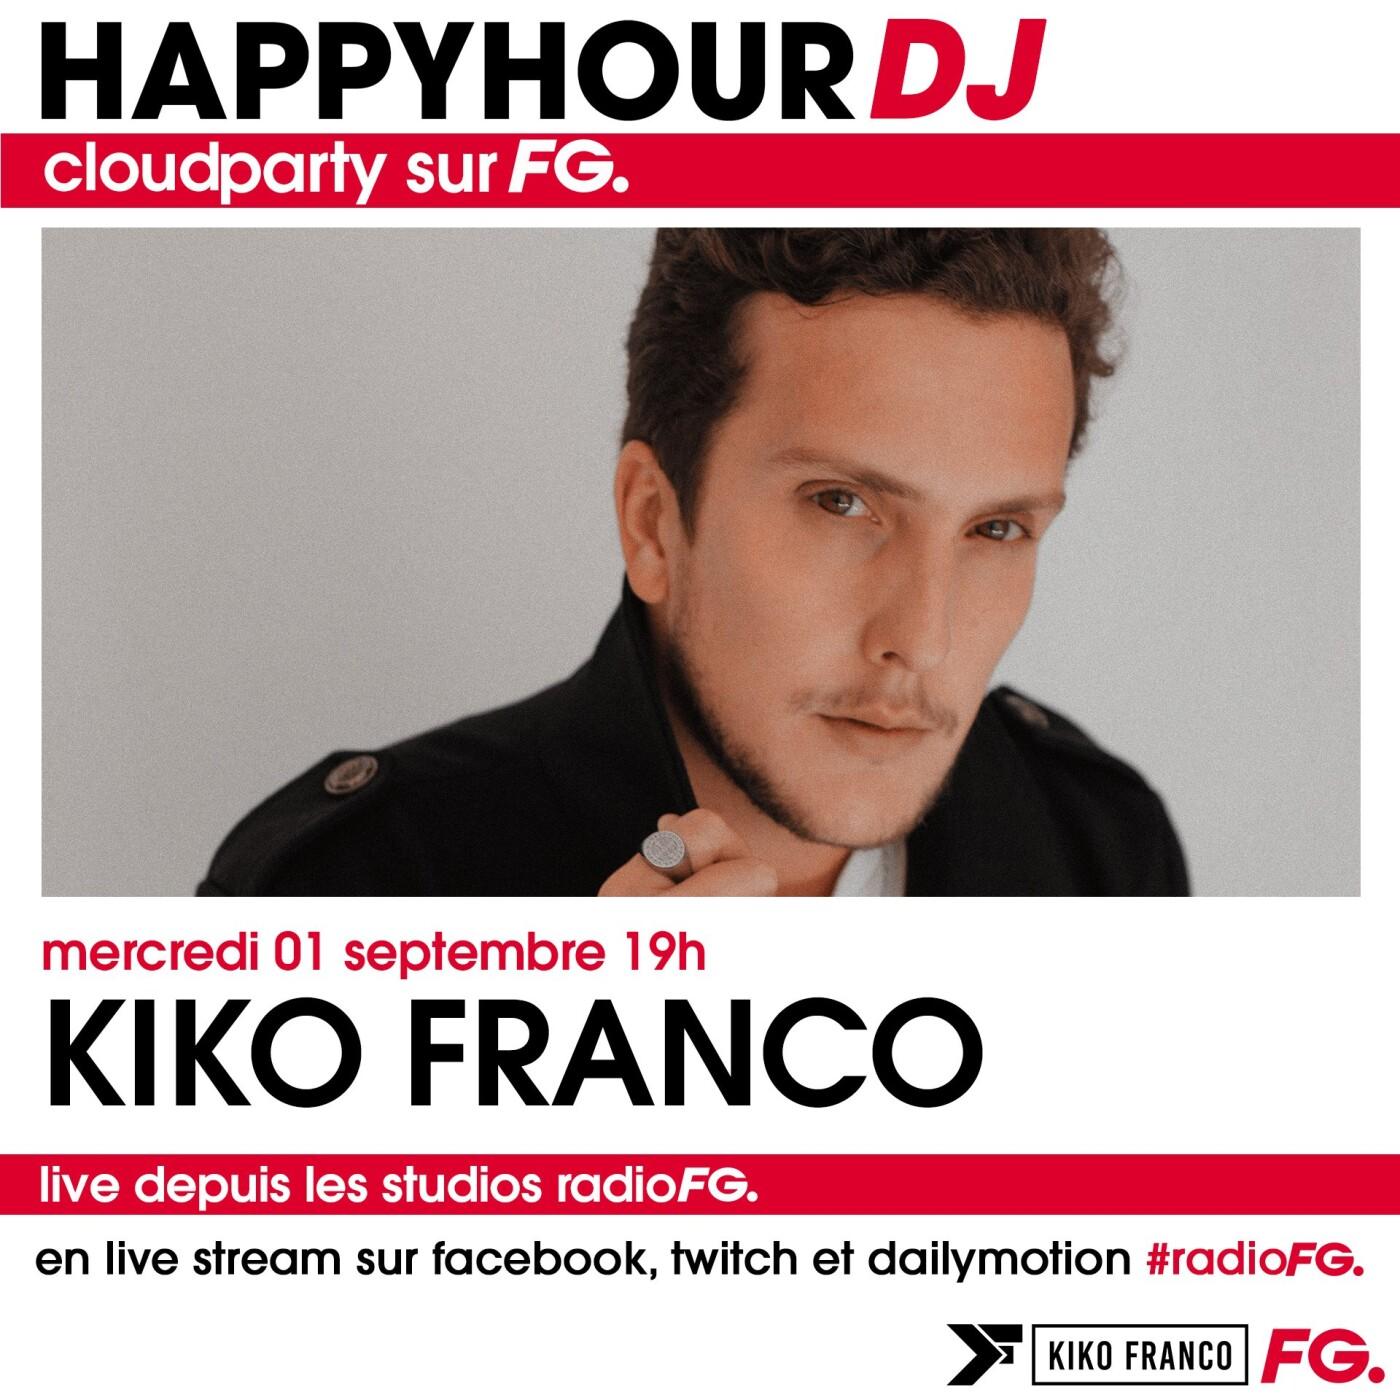 HAPPY HOUR DJ : KIKO FRANCO